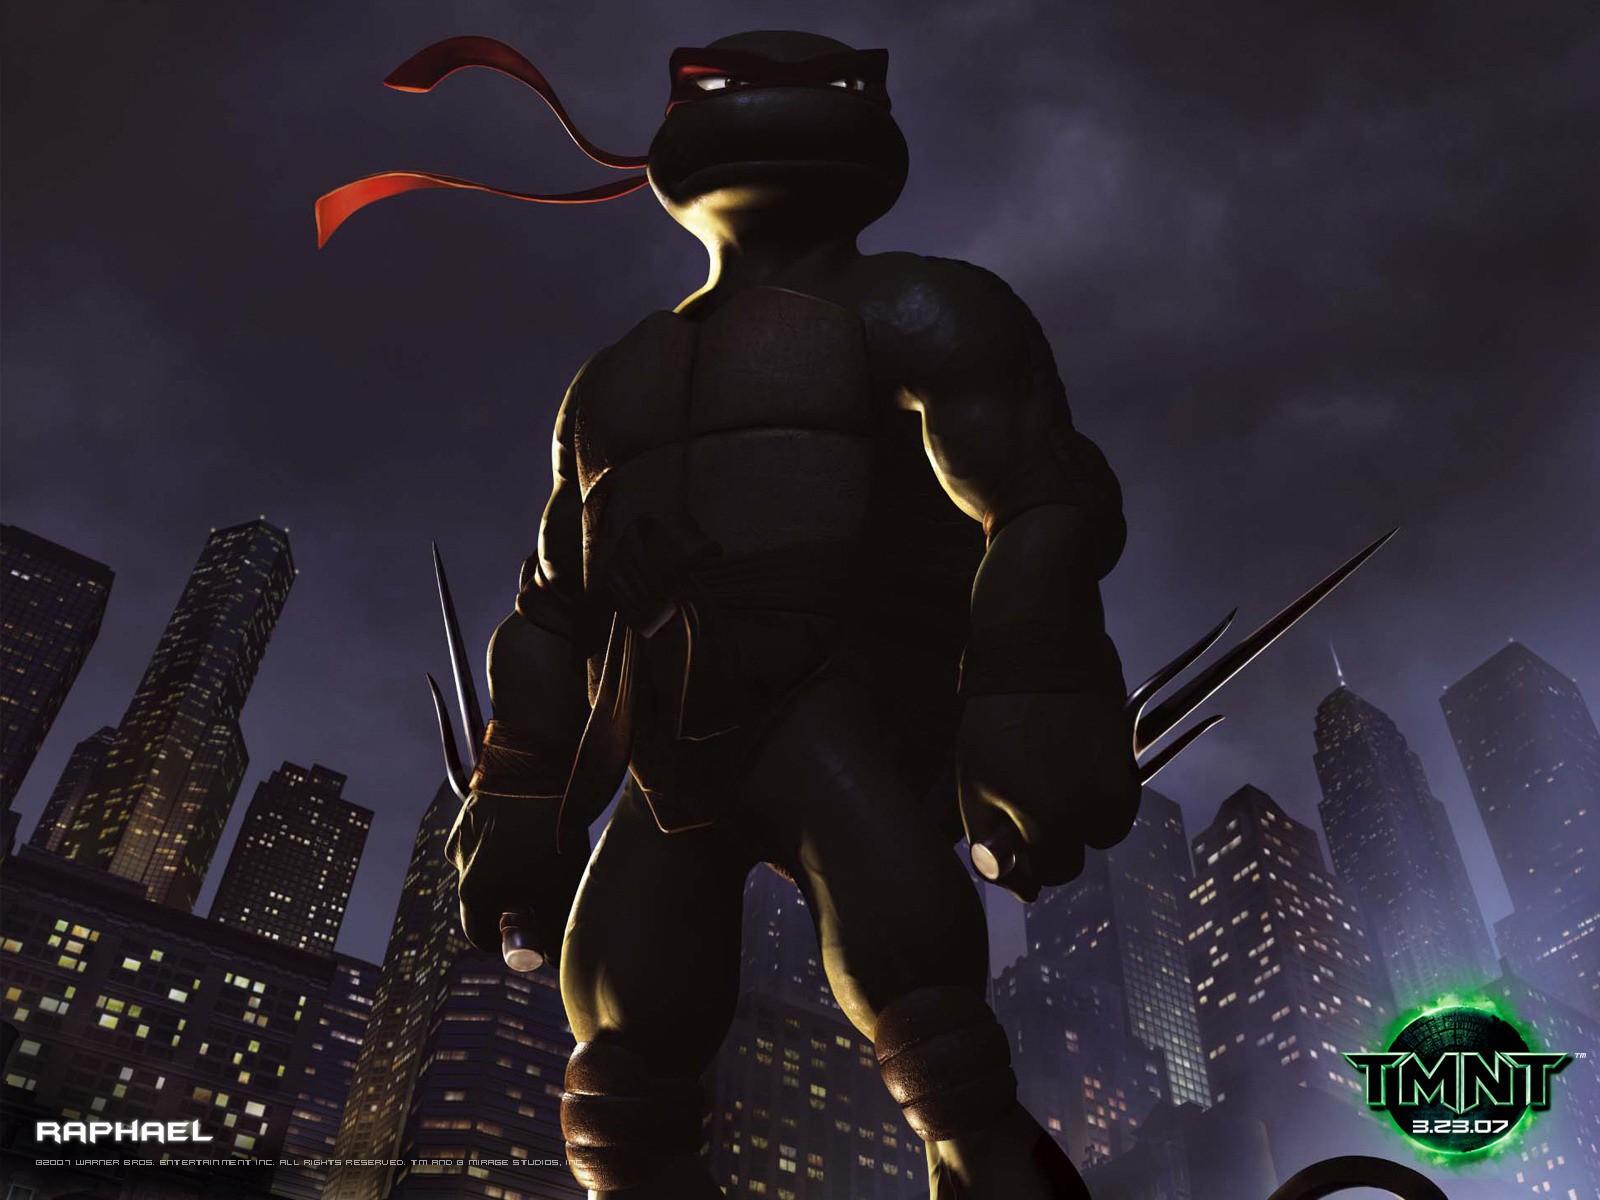 Un wallpaper di Raffaello per il  film 'Teenage Mutant Ninja Turtles Photo'